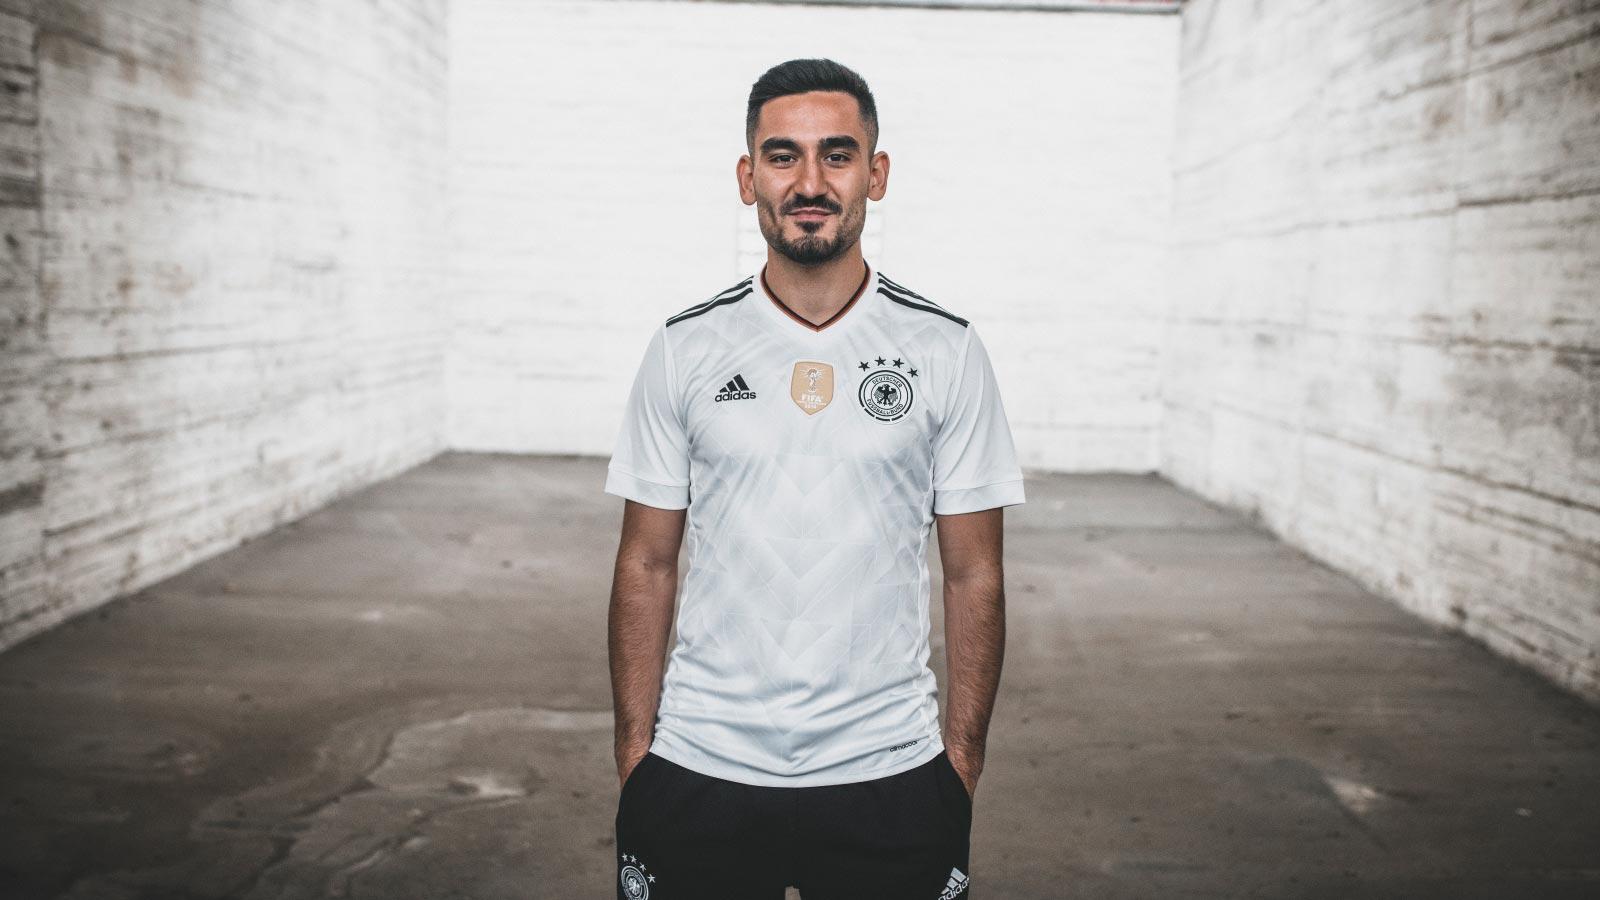 germany-2017-confed-cup-kit-gundogan